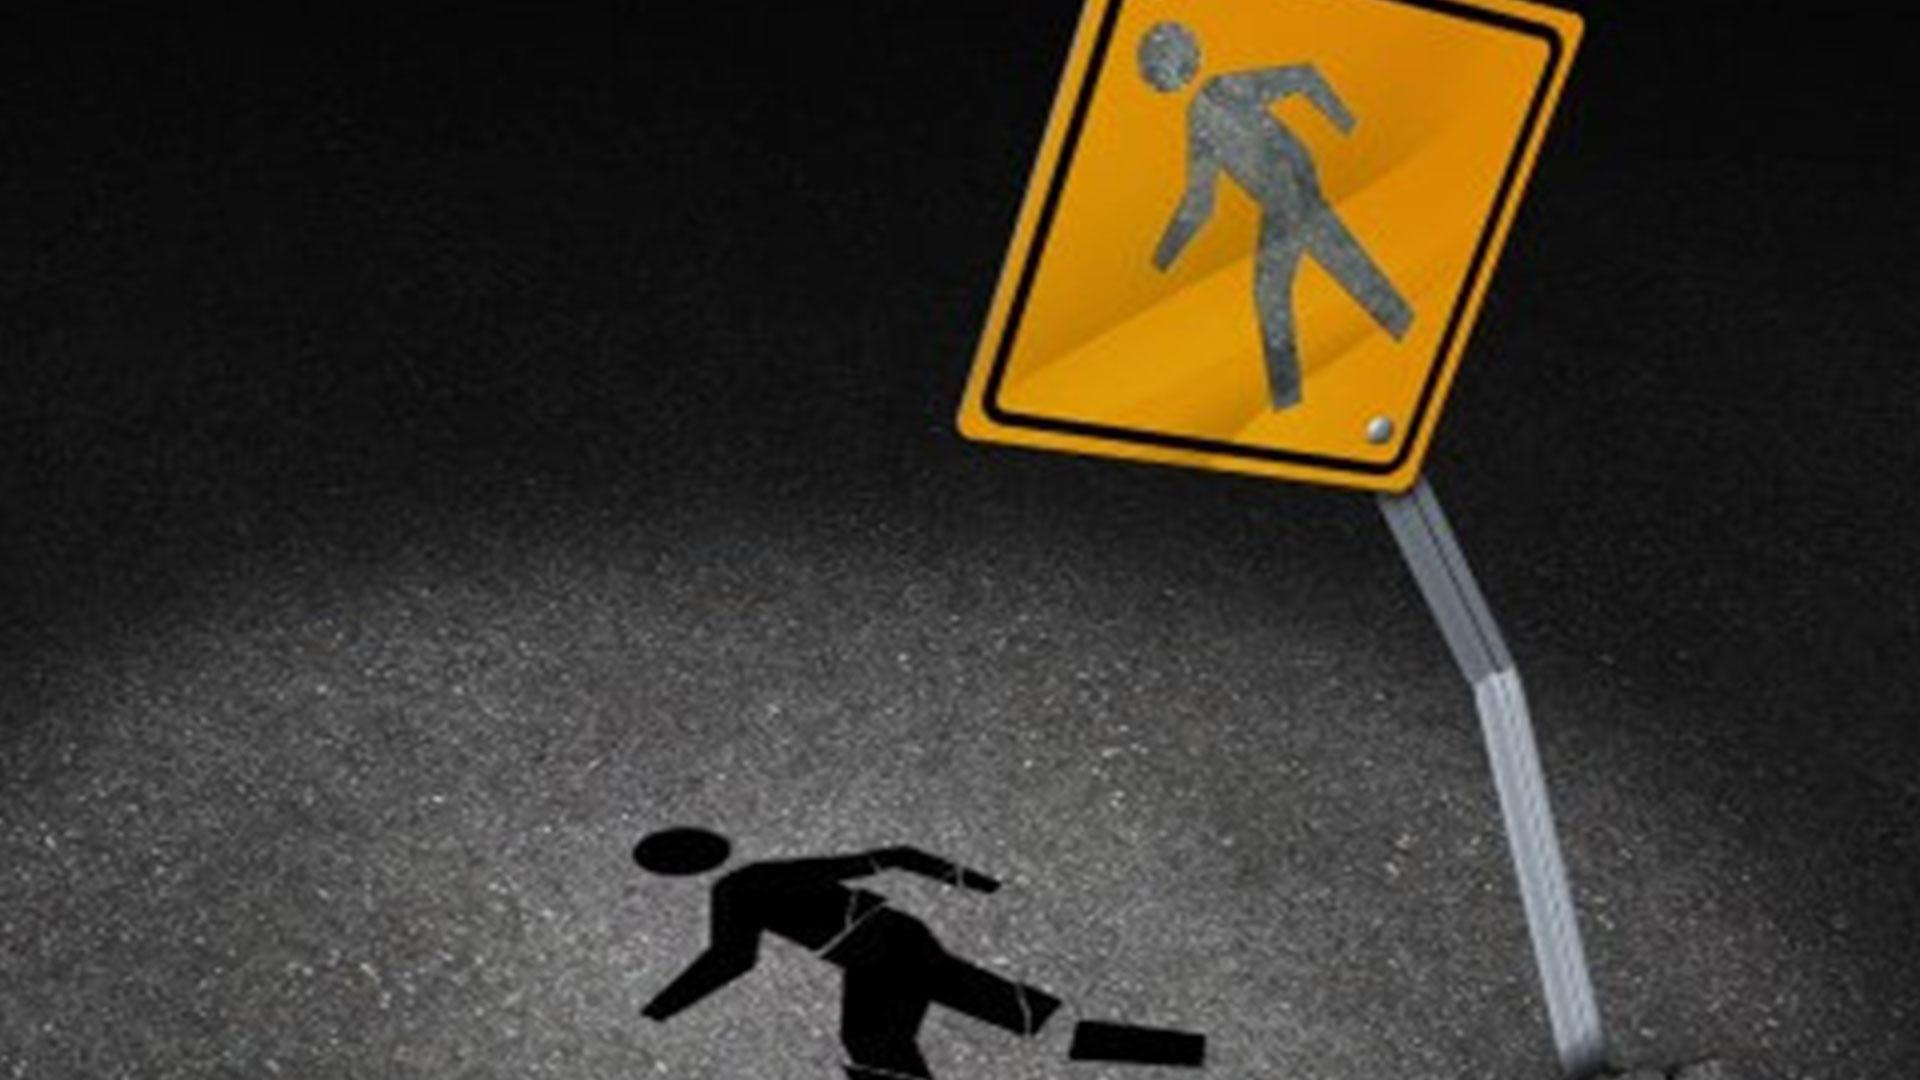 VANDERBIJLPARK-Child left critical following collision